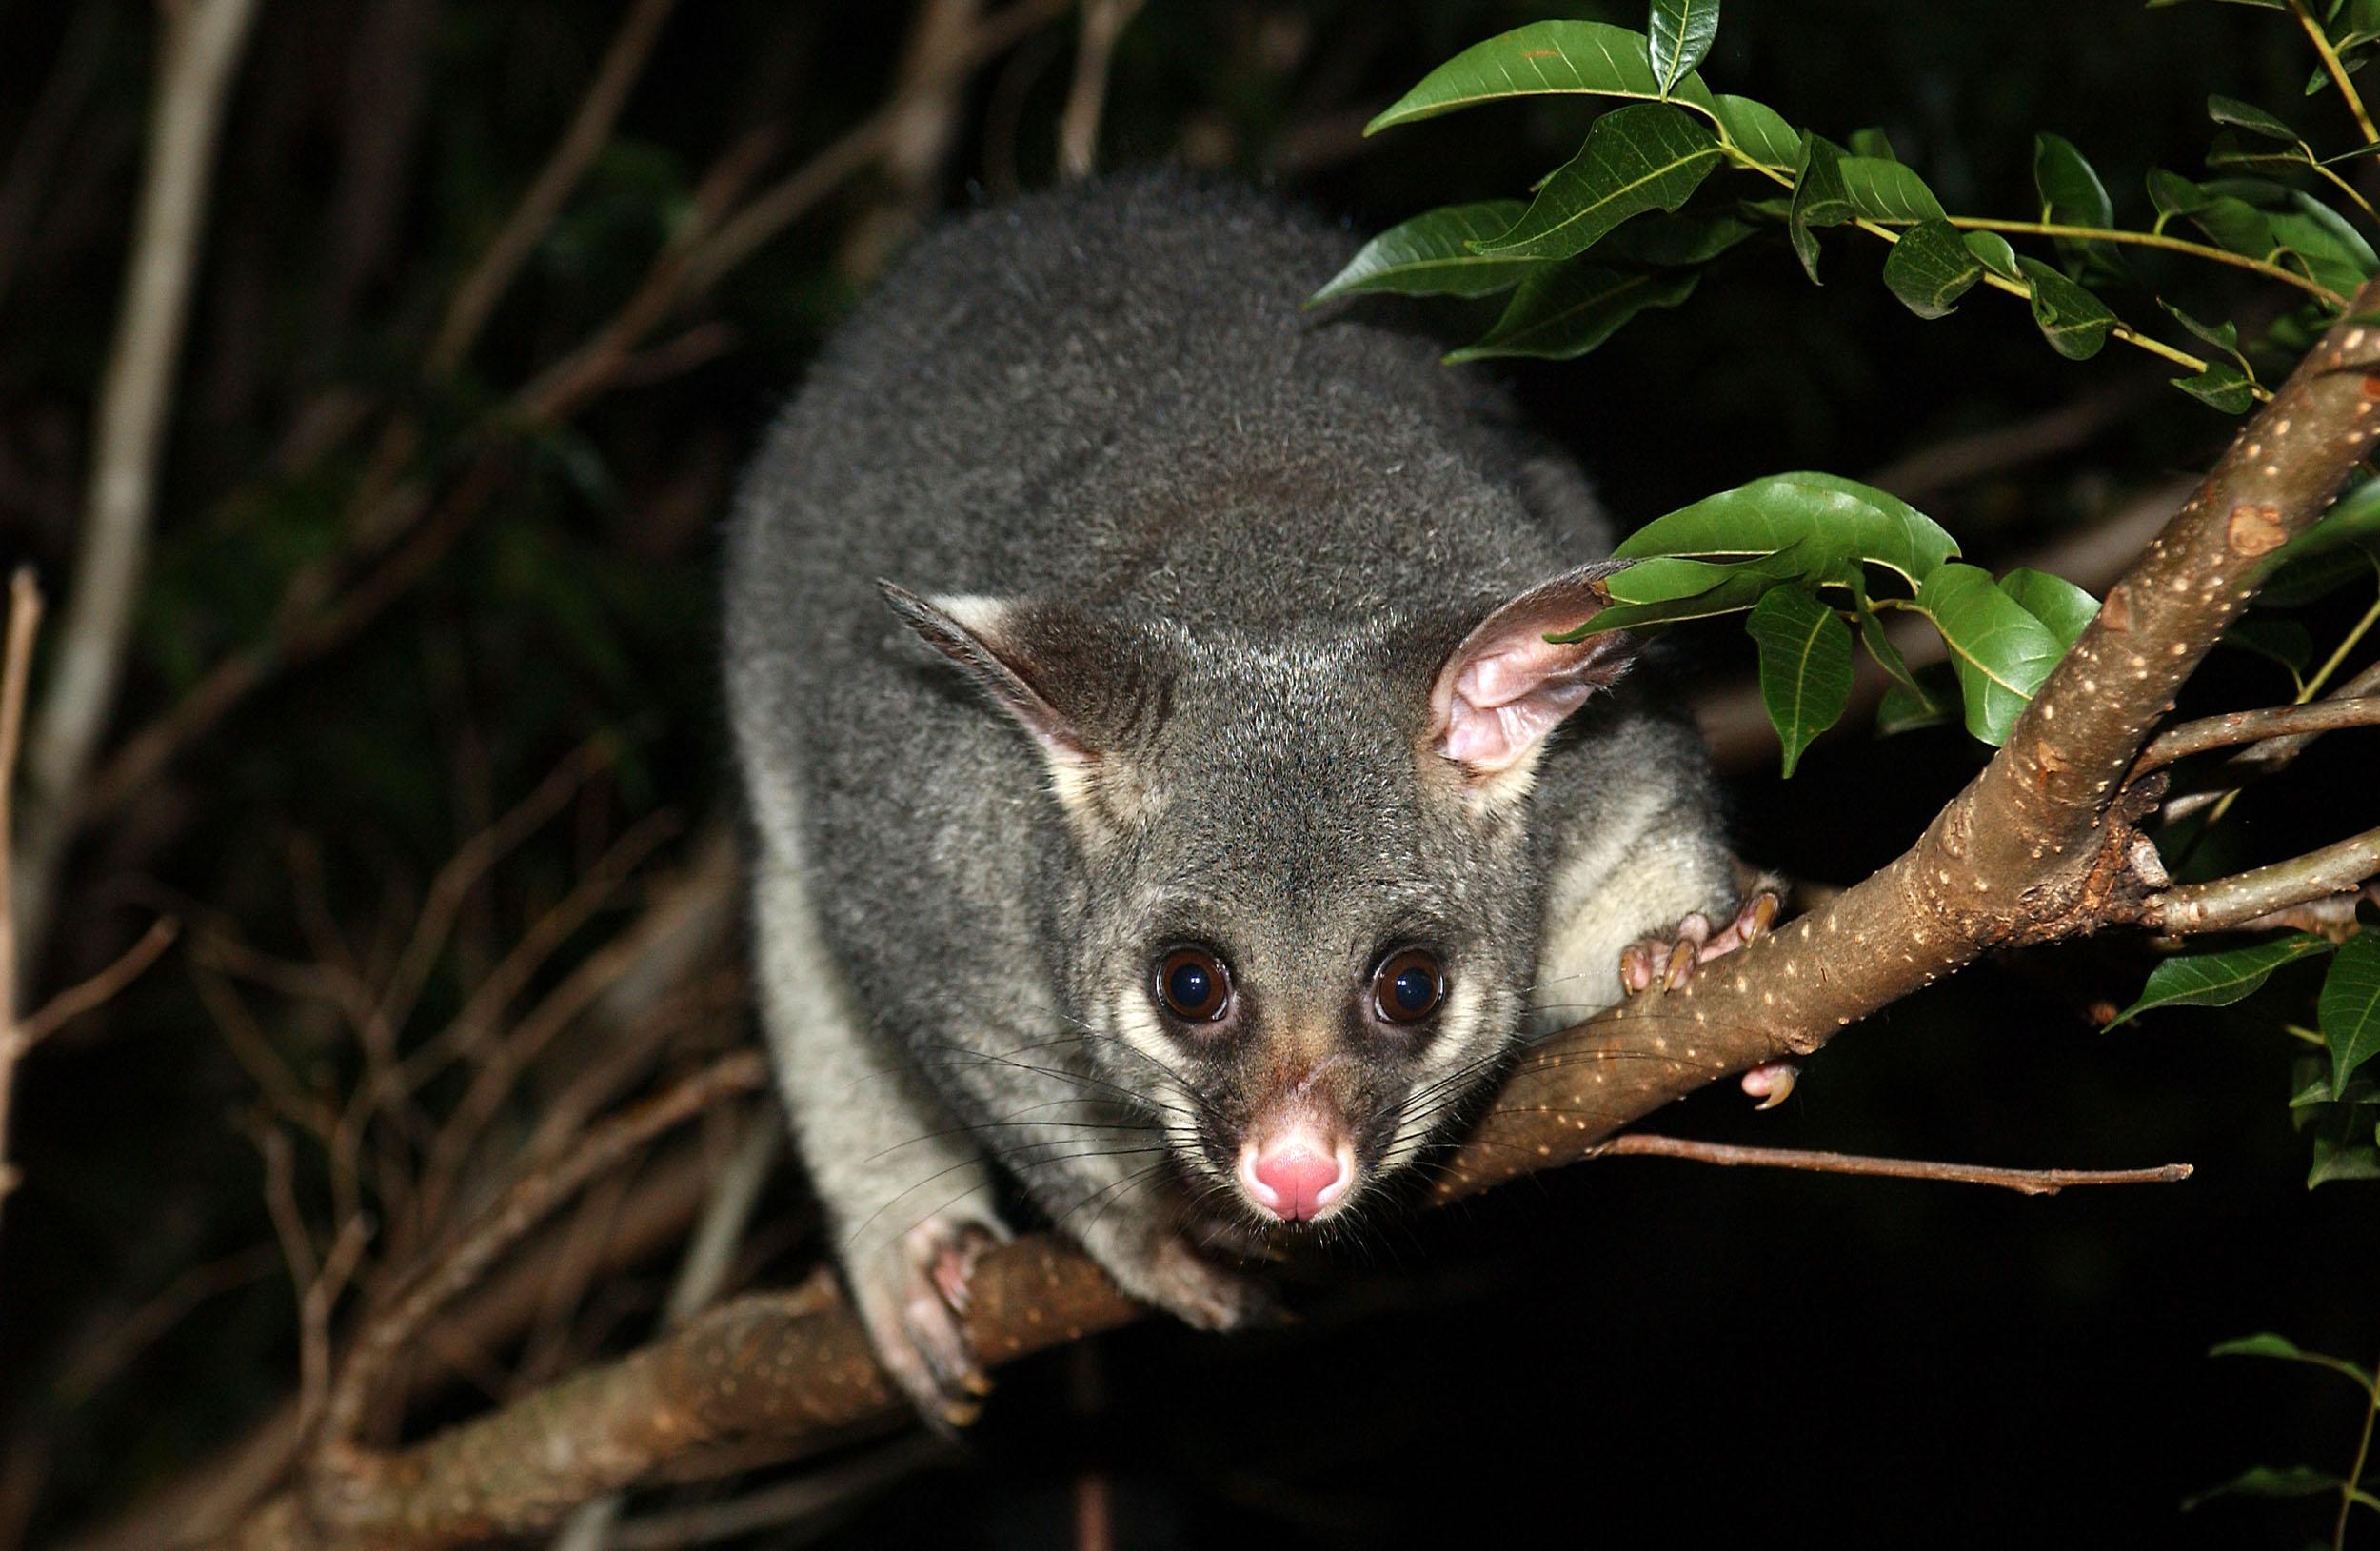 Creating_habitat_for_wildlife_such_as_the_Brushtail_possum_(8065737659).jpg